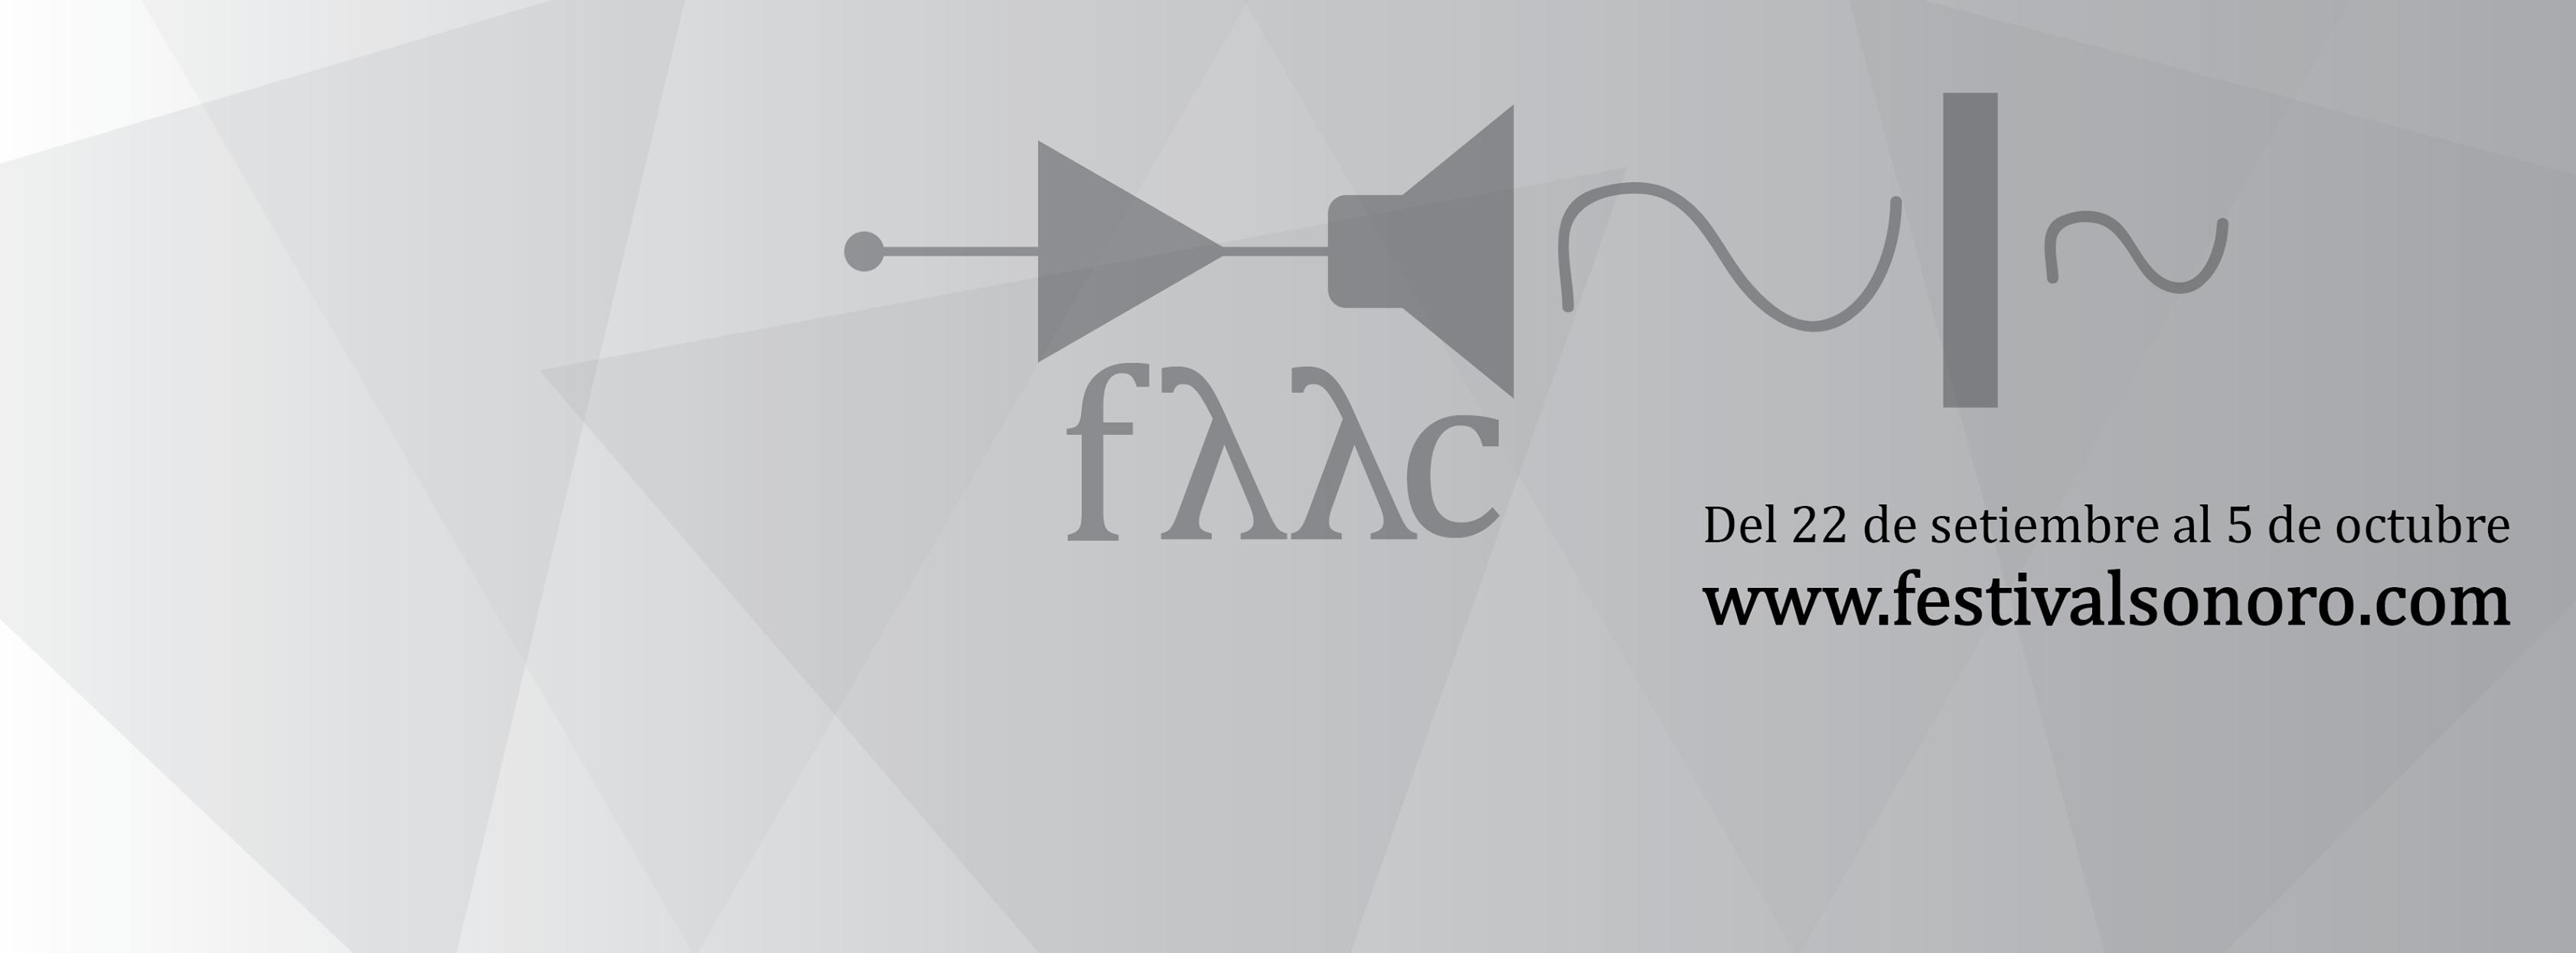 FAAC - Festival de Audio y Acústica Costarricense.